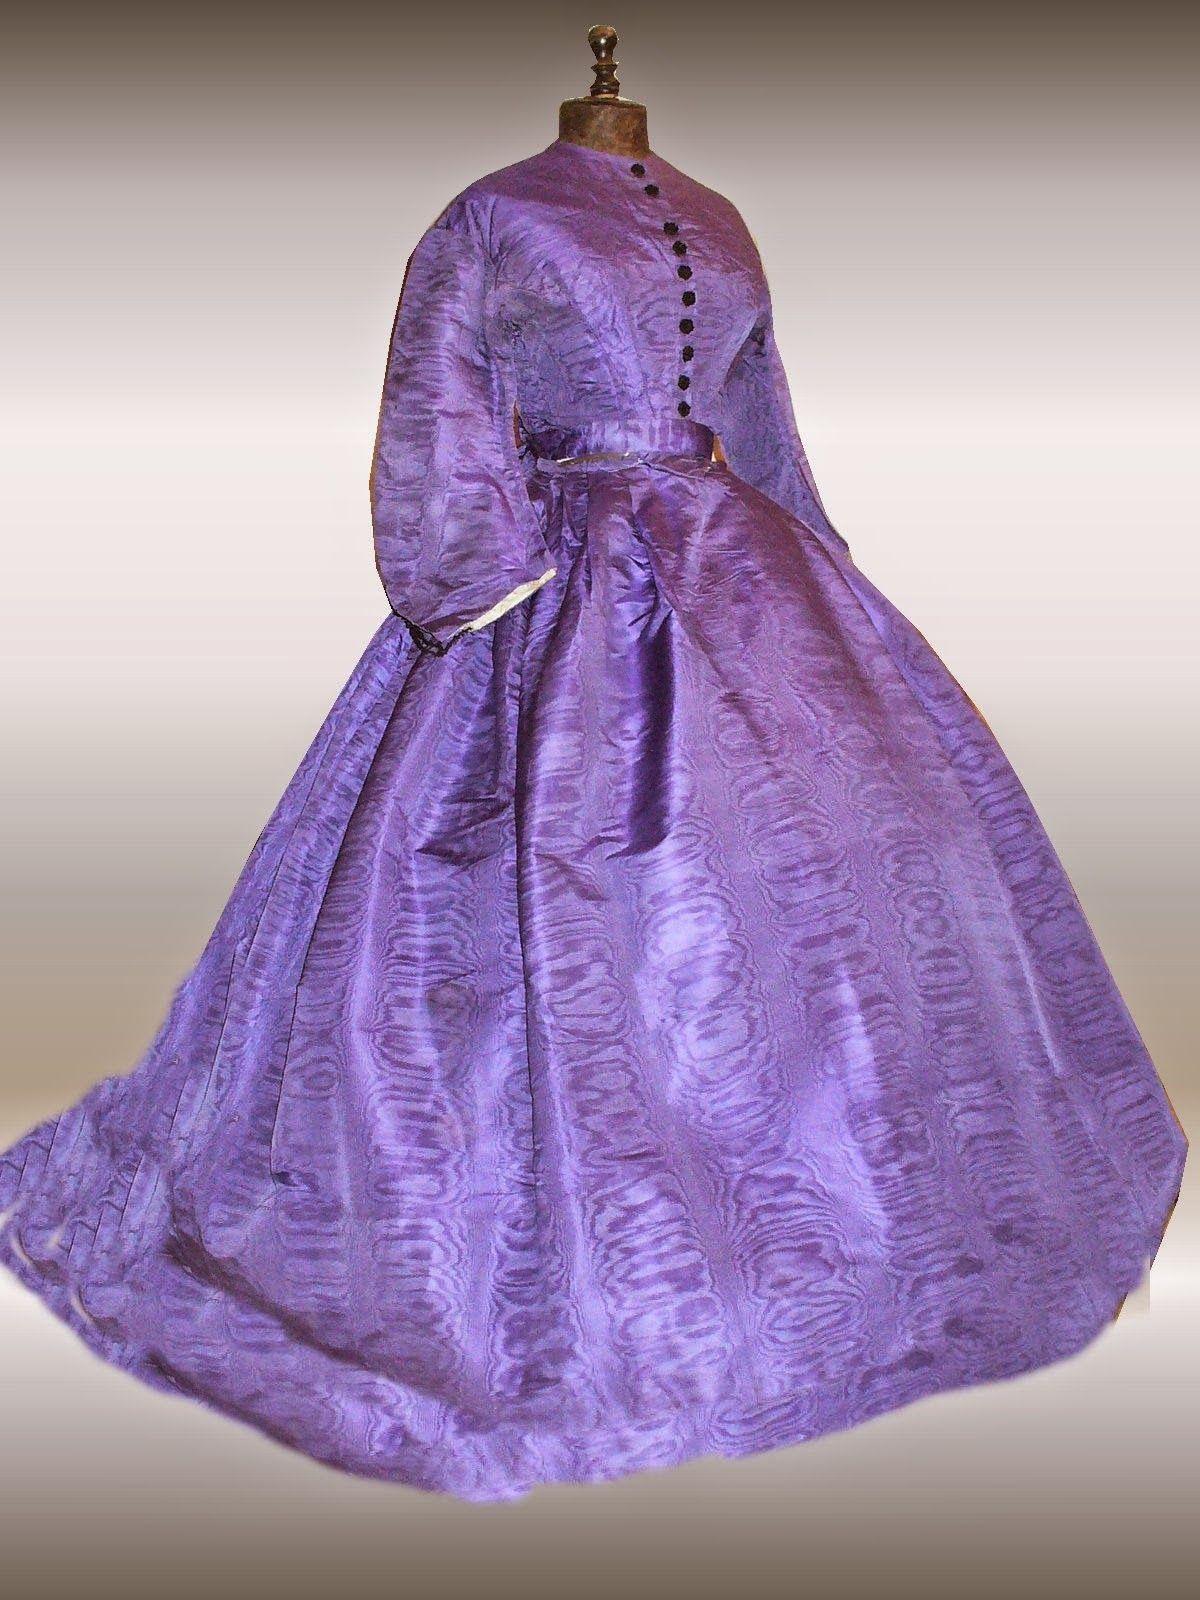 All The Pretty Dresses 1860 S Lavender Colored Dress Lavender Color Dress Historical Dresses Dresses [ 1600 x 1200 Pixel ]